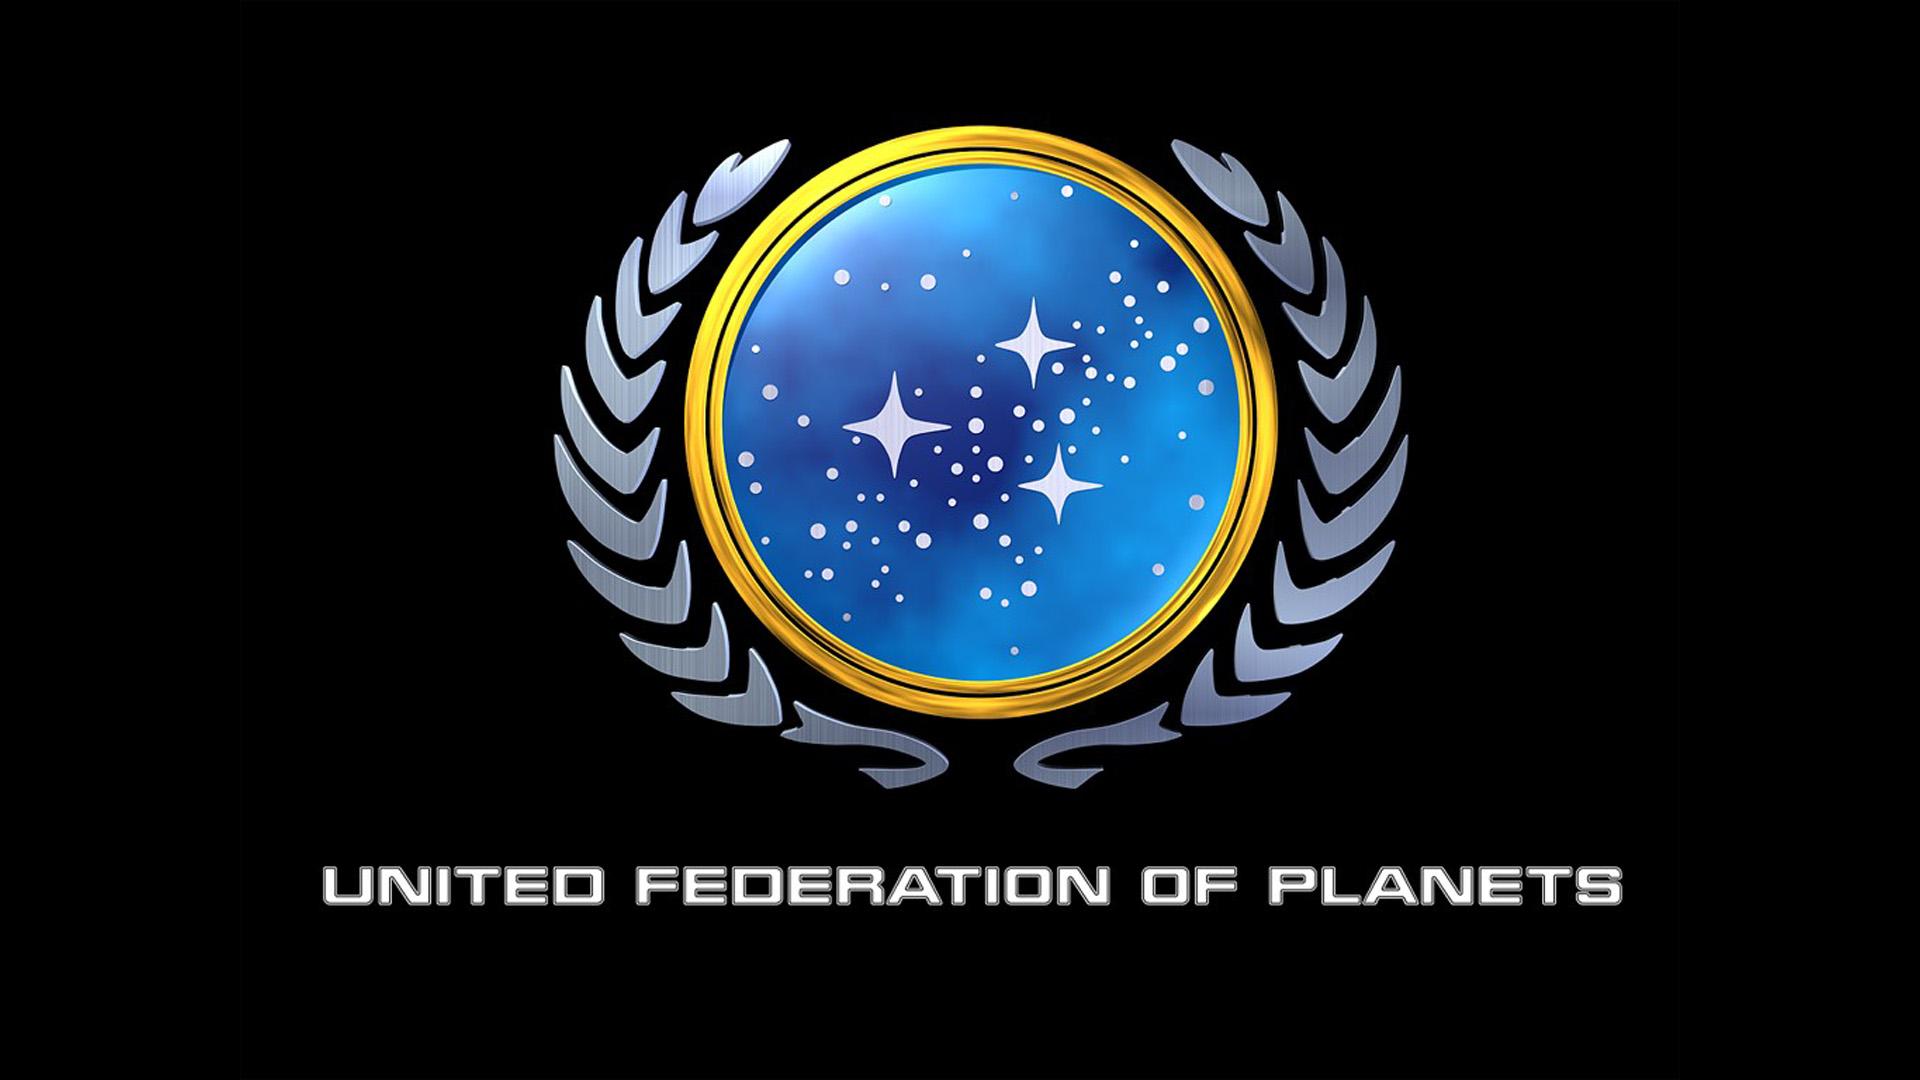 united federation of planets emblem - photo #1